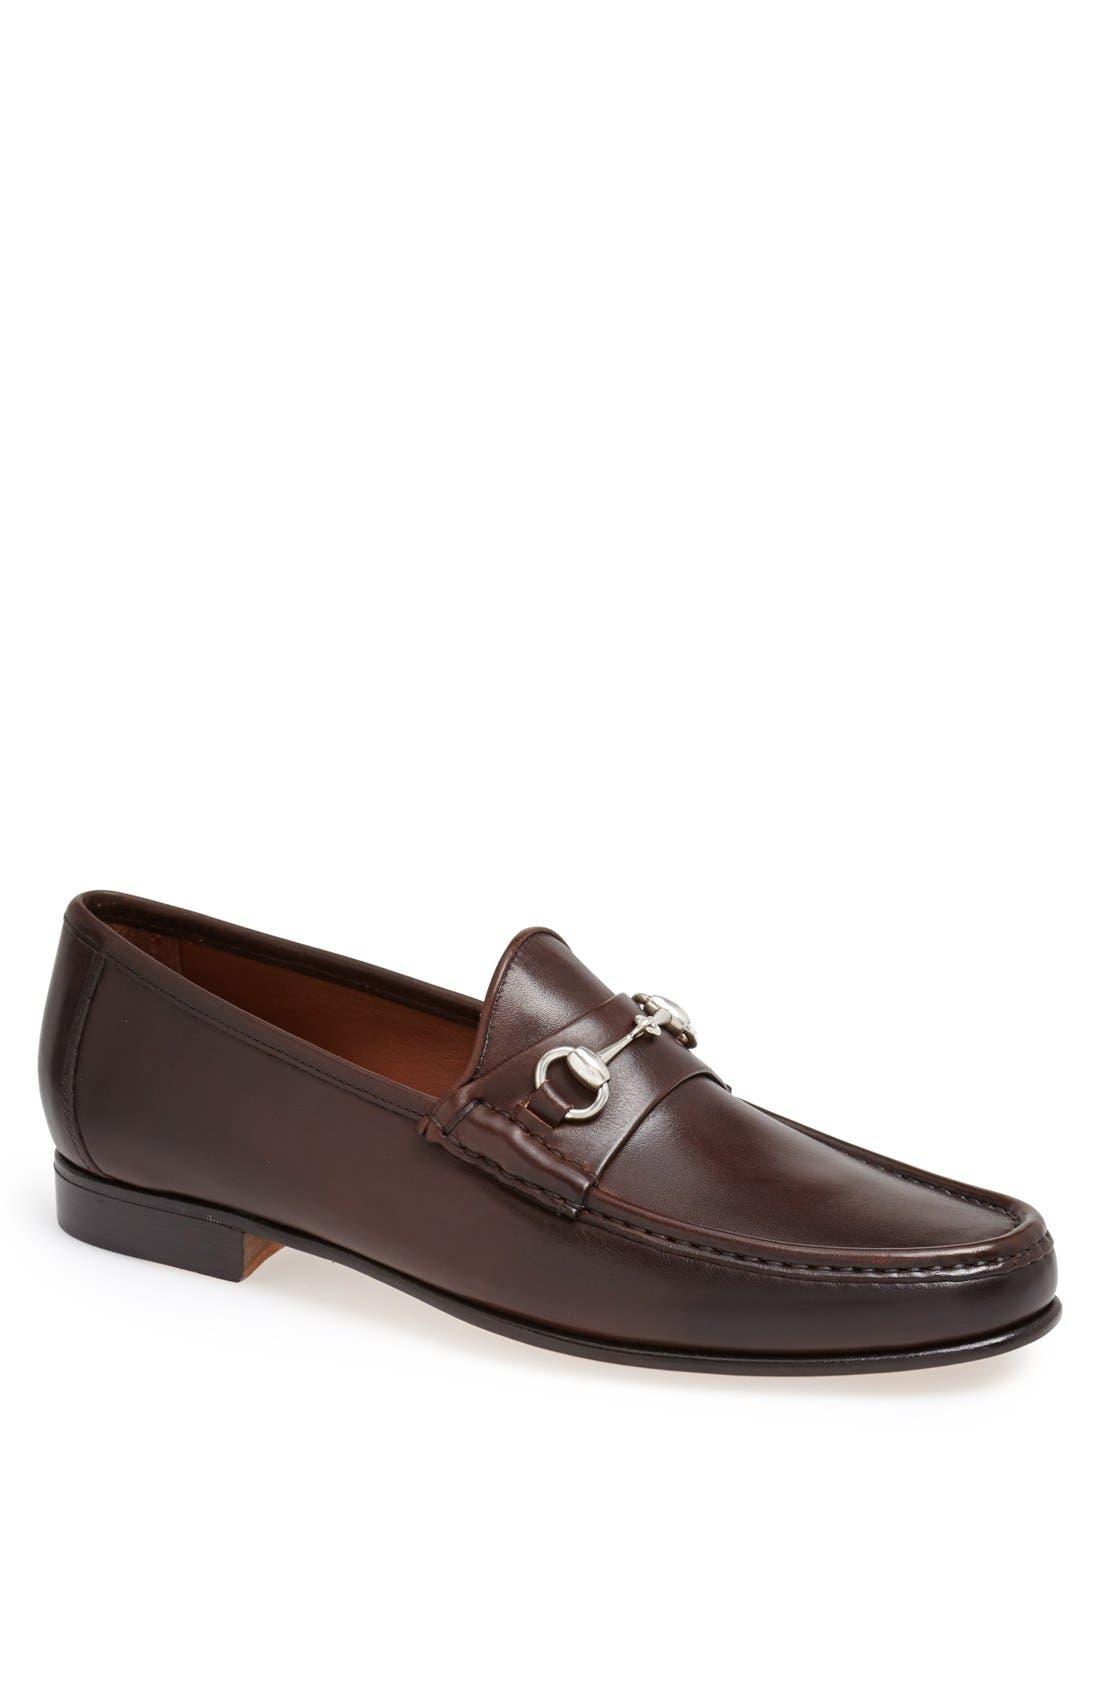 Verona II Bit Loafer,                         Main,                         color, BROWN/ BROWN